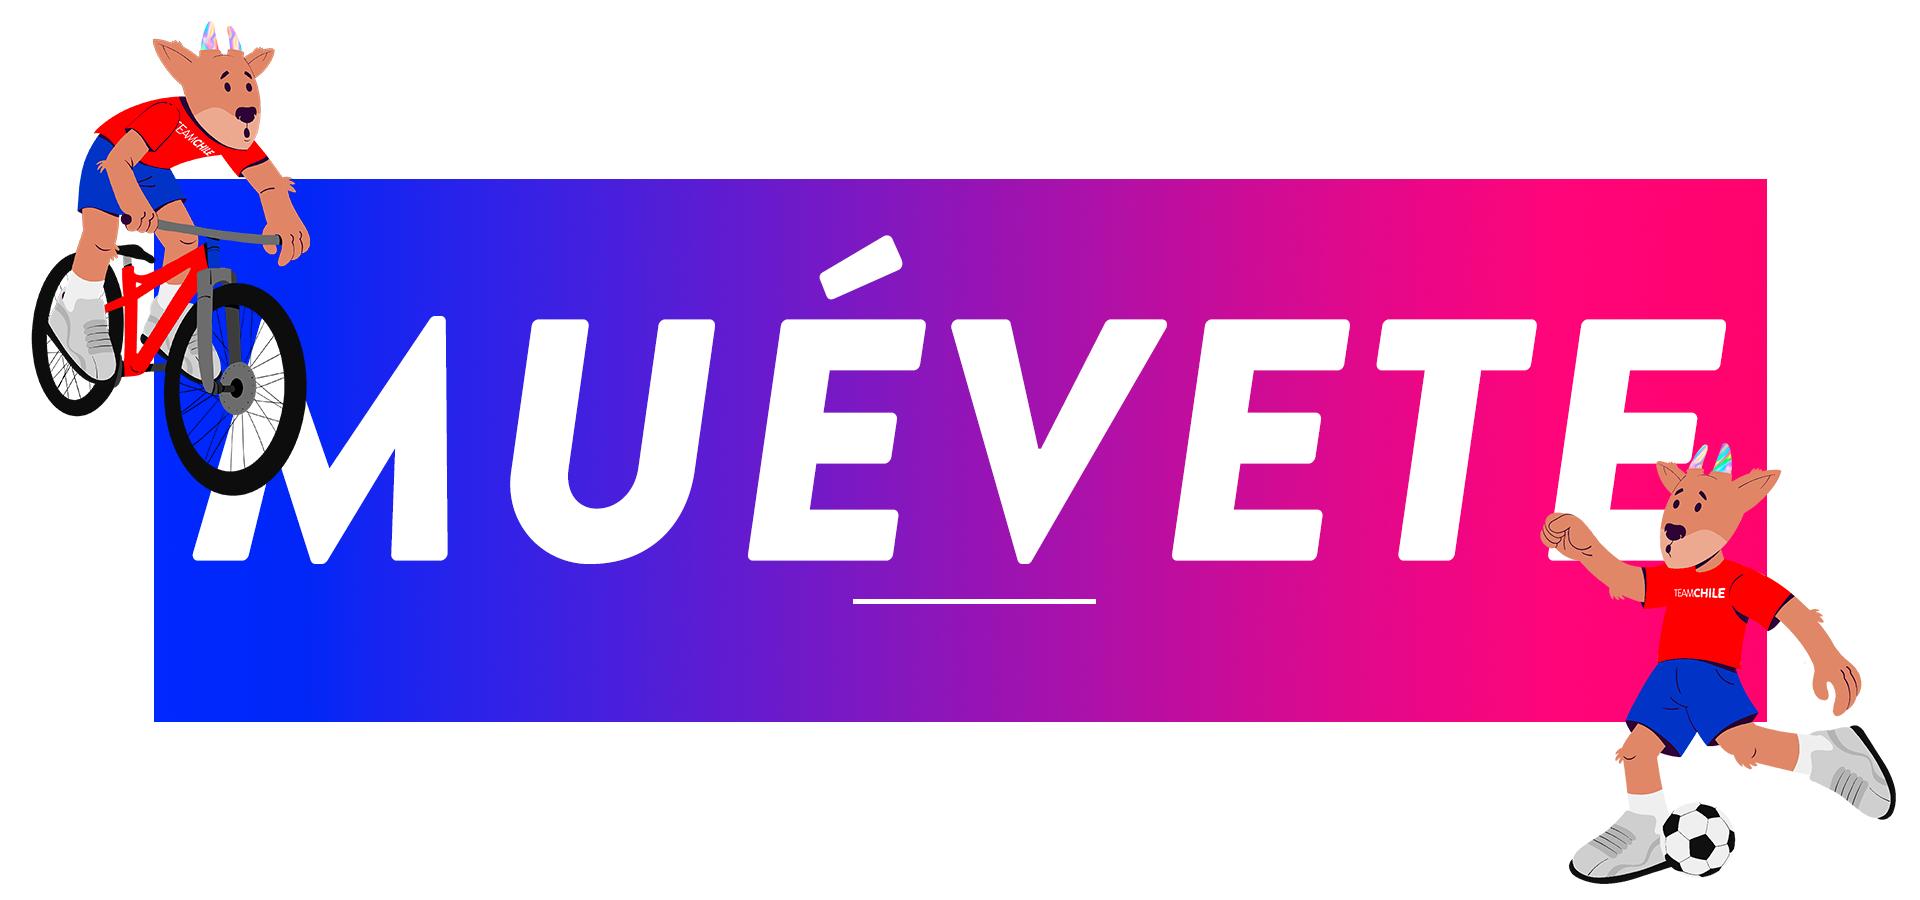 BANNER-INTERIOR-MUÉVETE-NUEVO